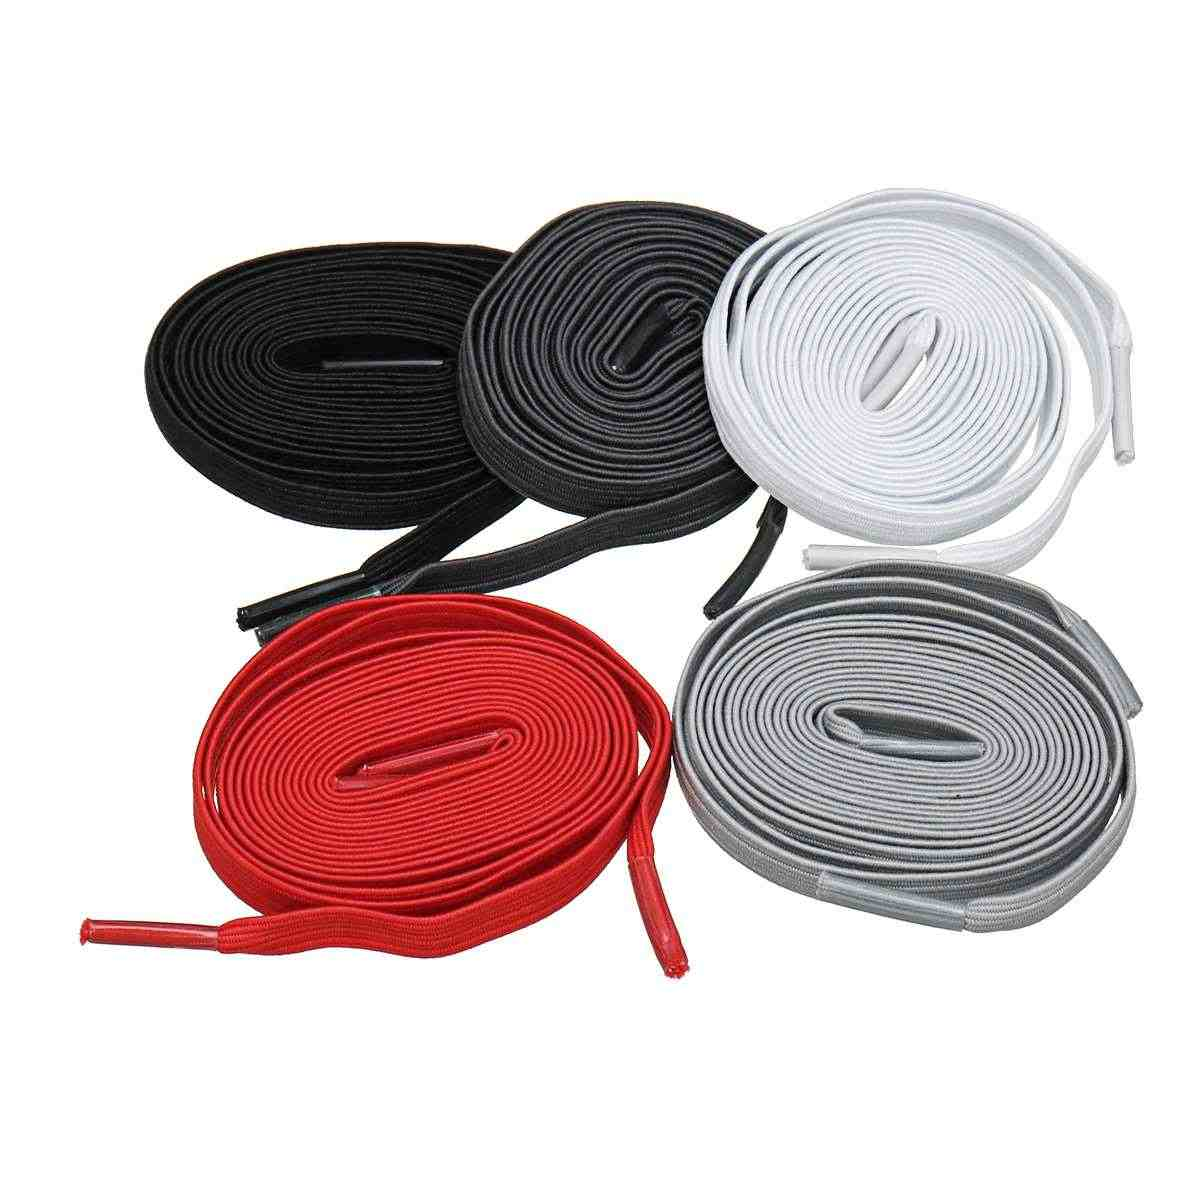 100cm Unisex ผู้ใหญ่เด็กยืดหยุ่นรองเท้า Lazy Laces รองเท้ากีฬาโพลีเอสเตอร์ไม่มี Tie Shoelaces สีดำสีขาวสีเทาเข้ม Light สีเทาสีแดง